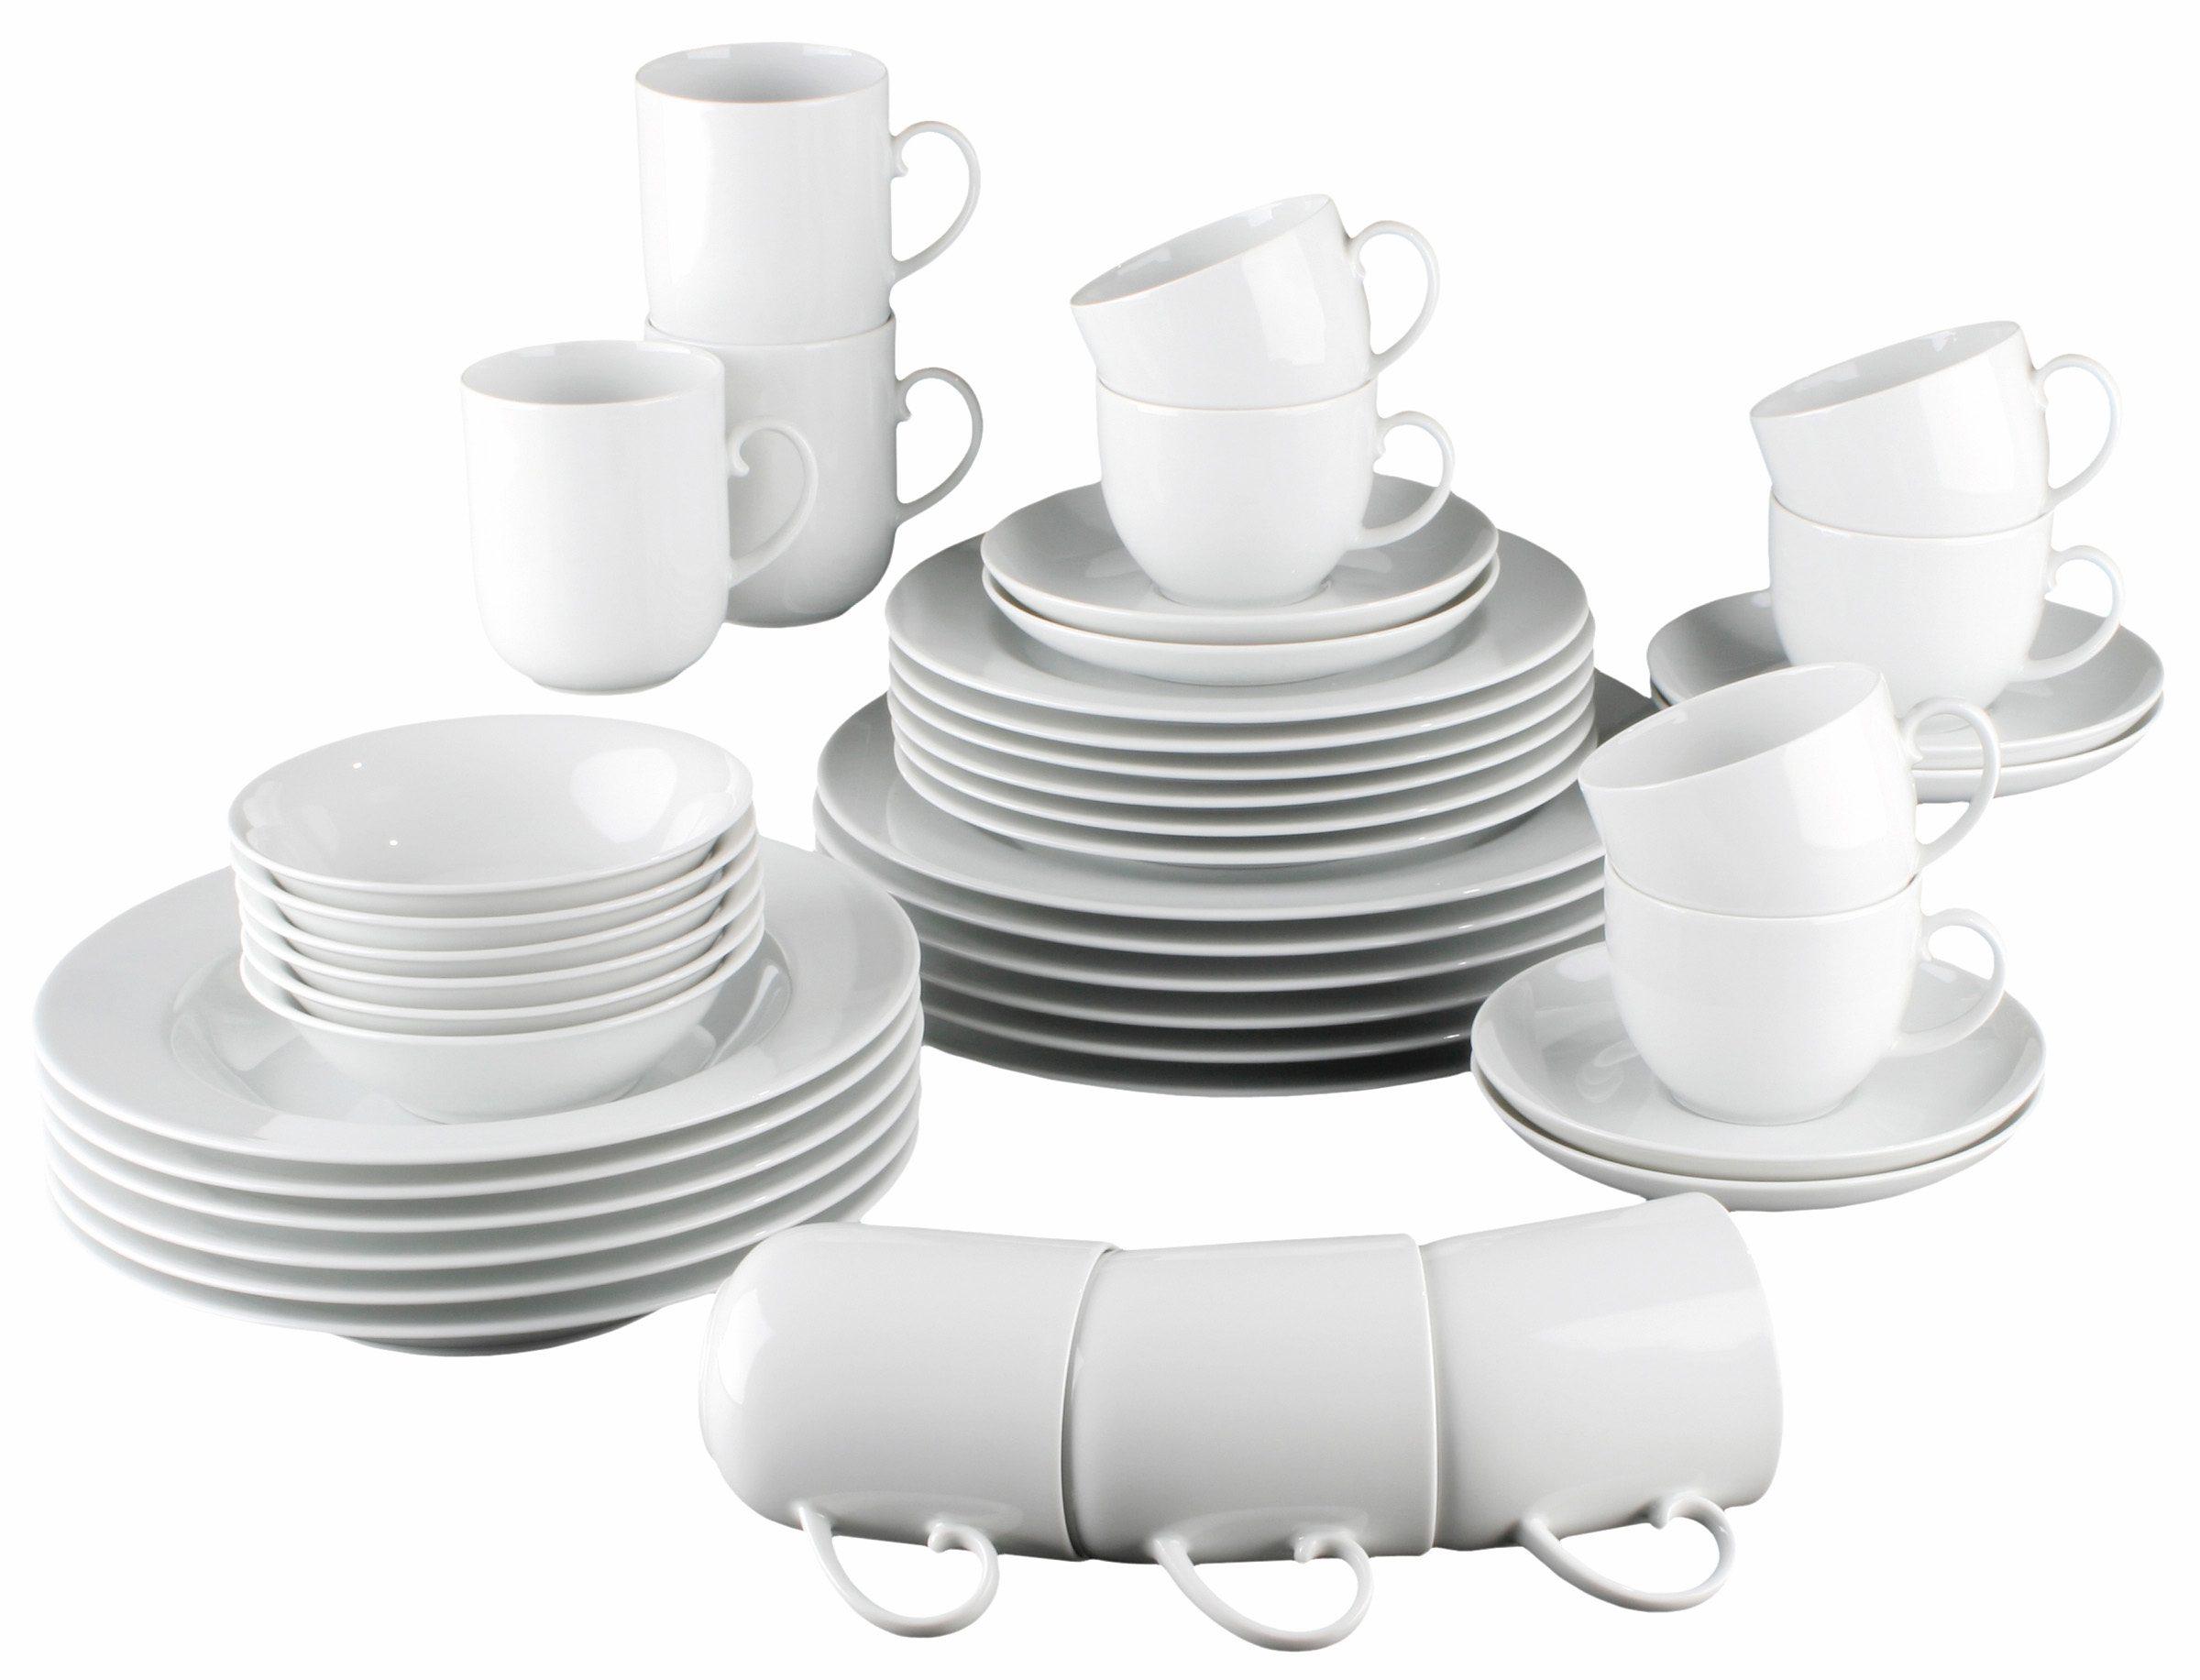 Seltmann Weiden Kombiservice, Porzellan, 42 Teile, »RONDO«